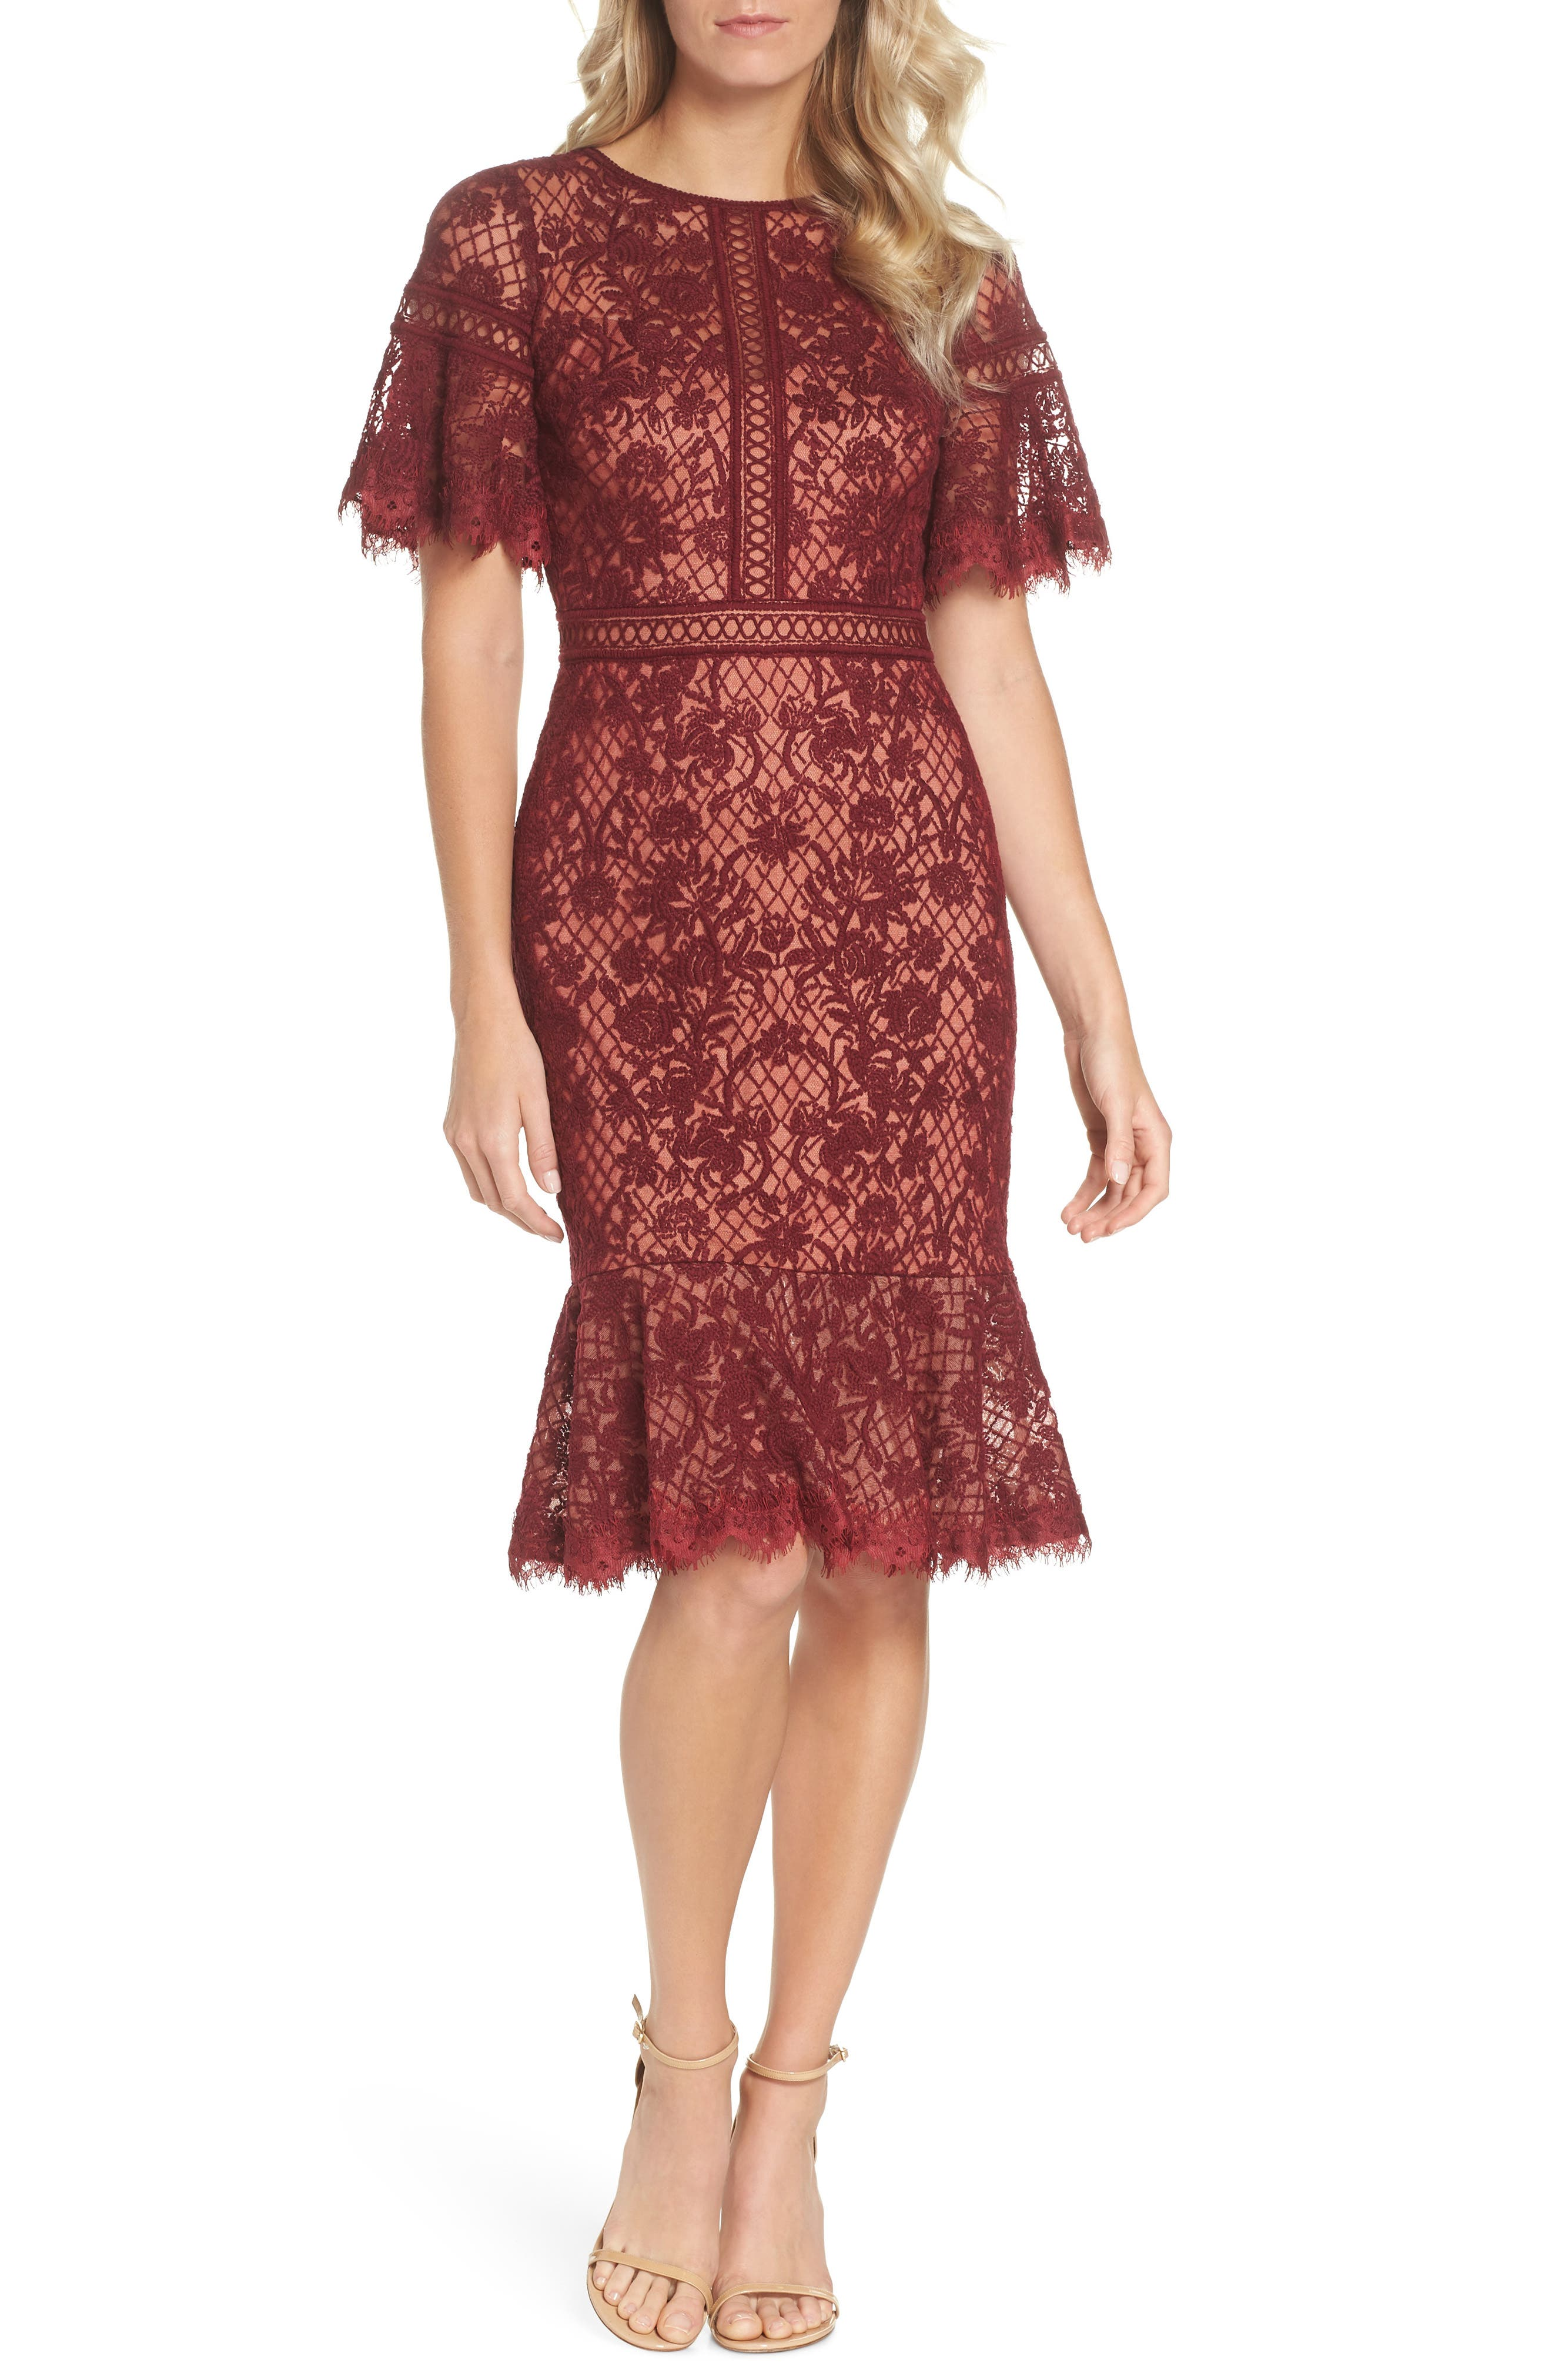 TADASHI SHOJI Embroidered Mesh Dress, Main, color, 603